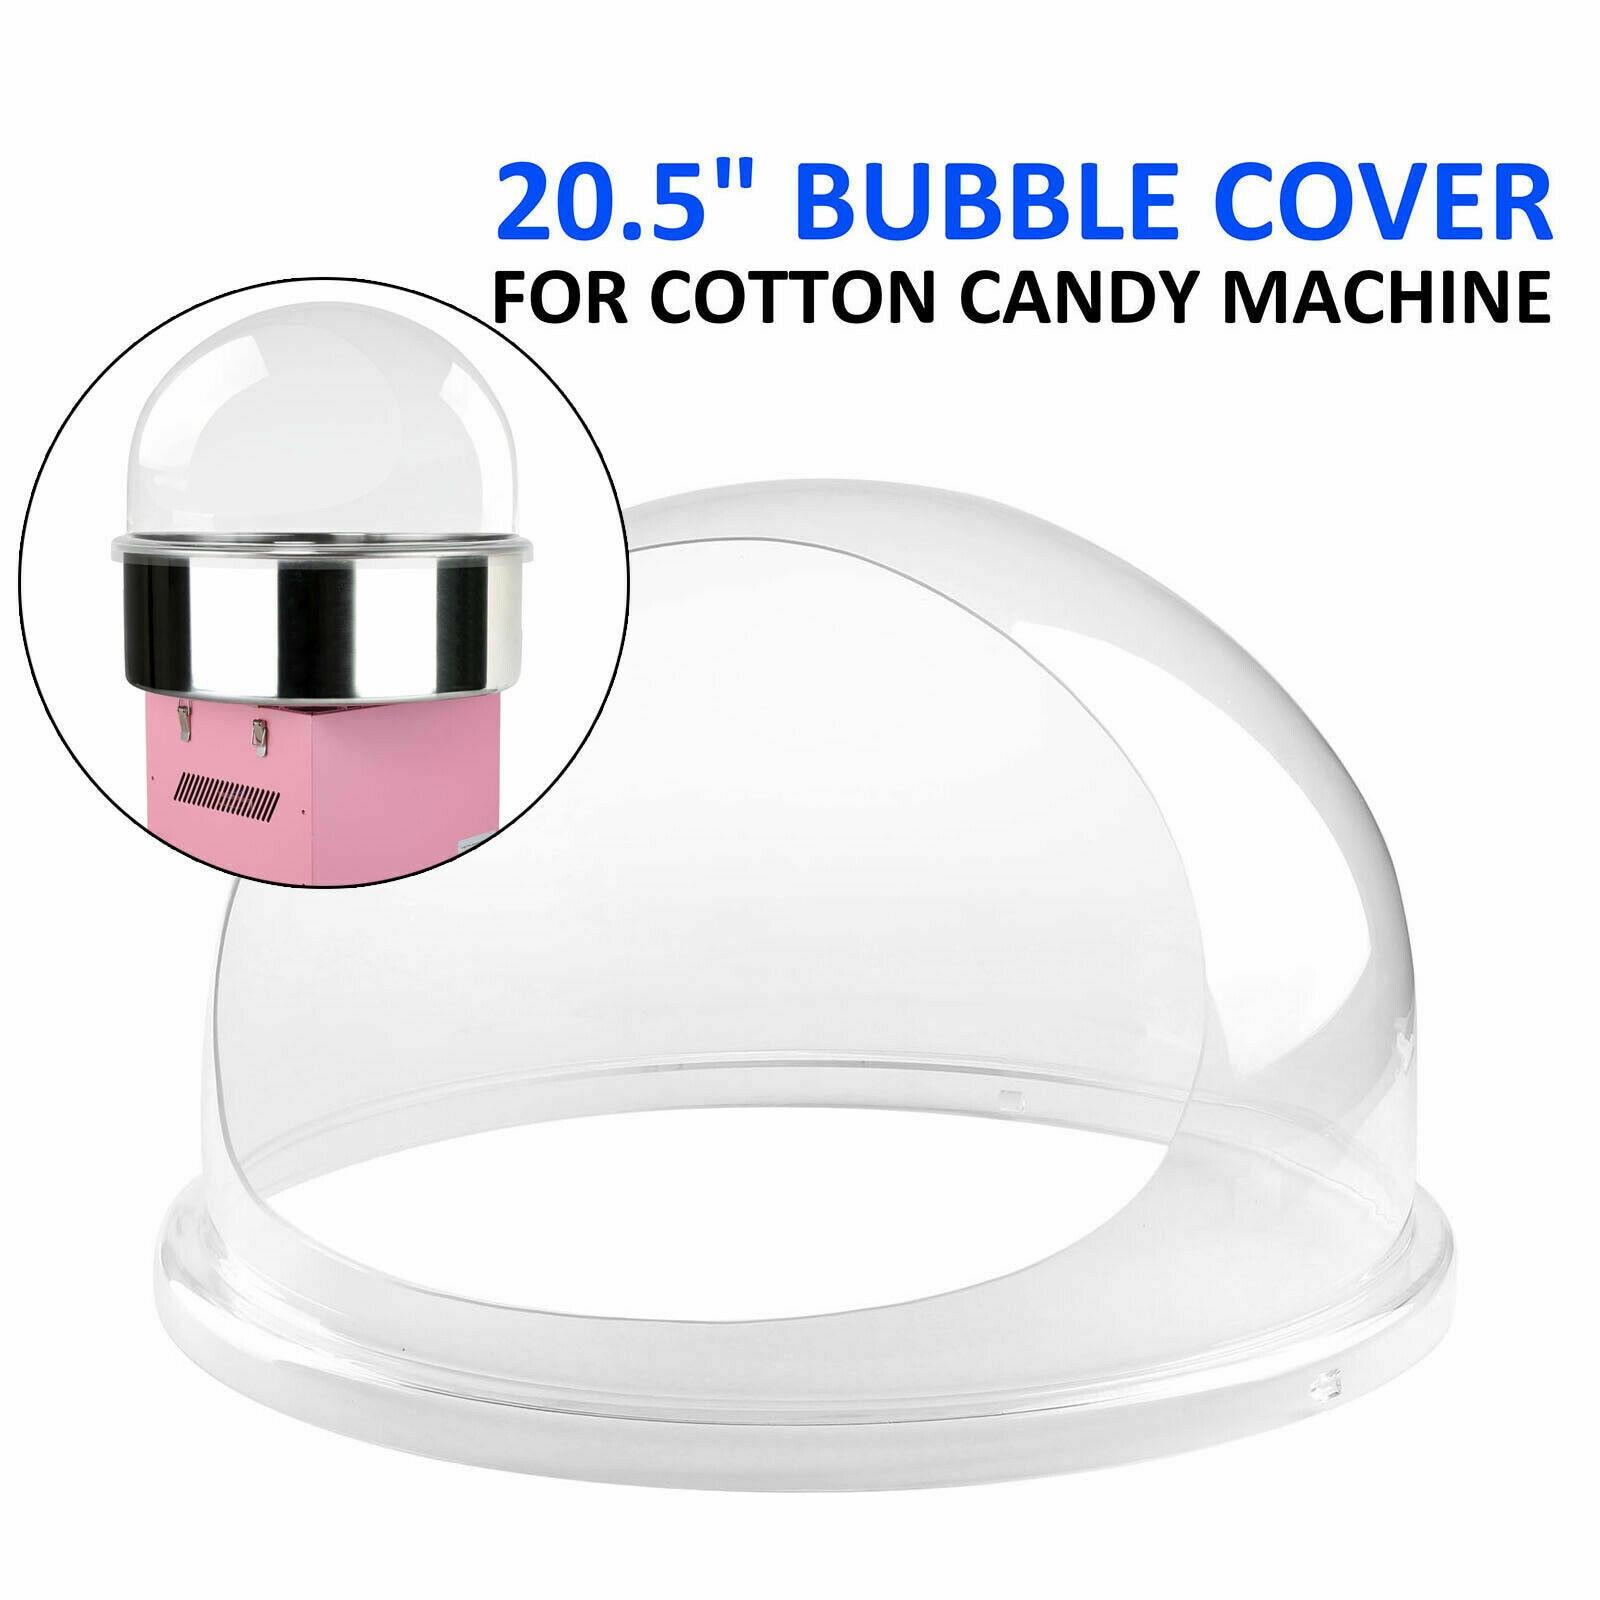 Yonntech, máquina comercial de caramelos de burbujas de 20,5 pulgadas, cubierta de cuenco de algodón de caramelo